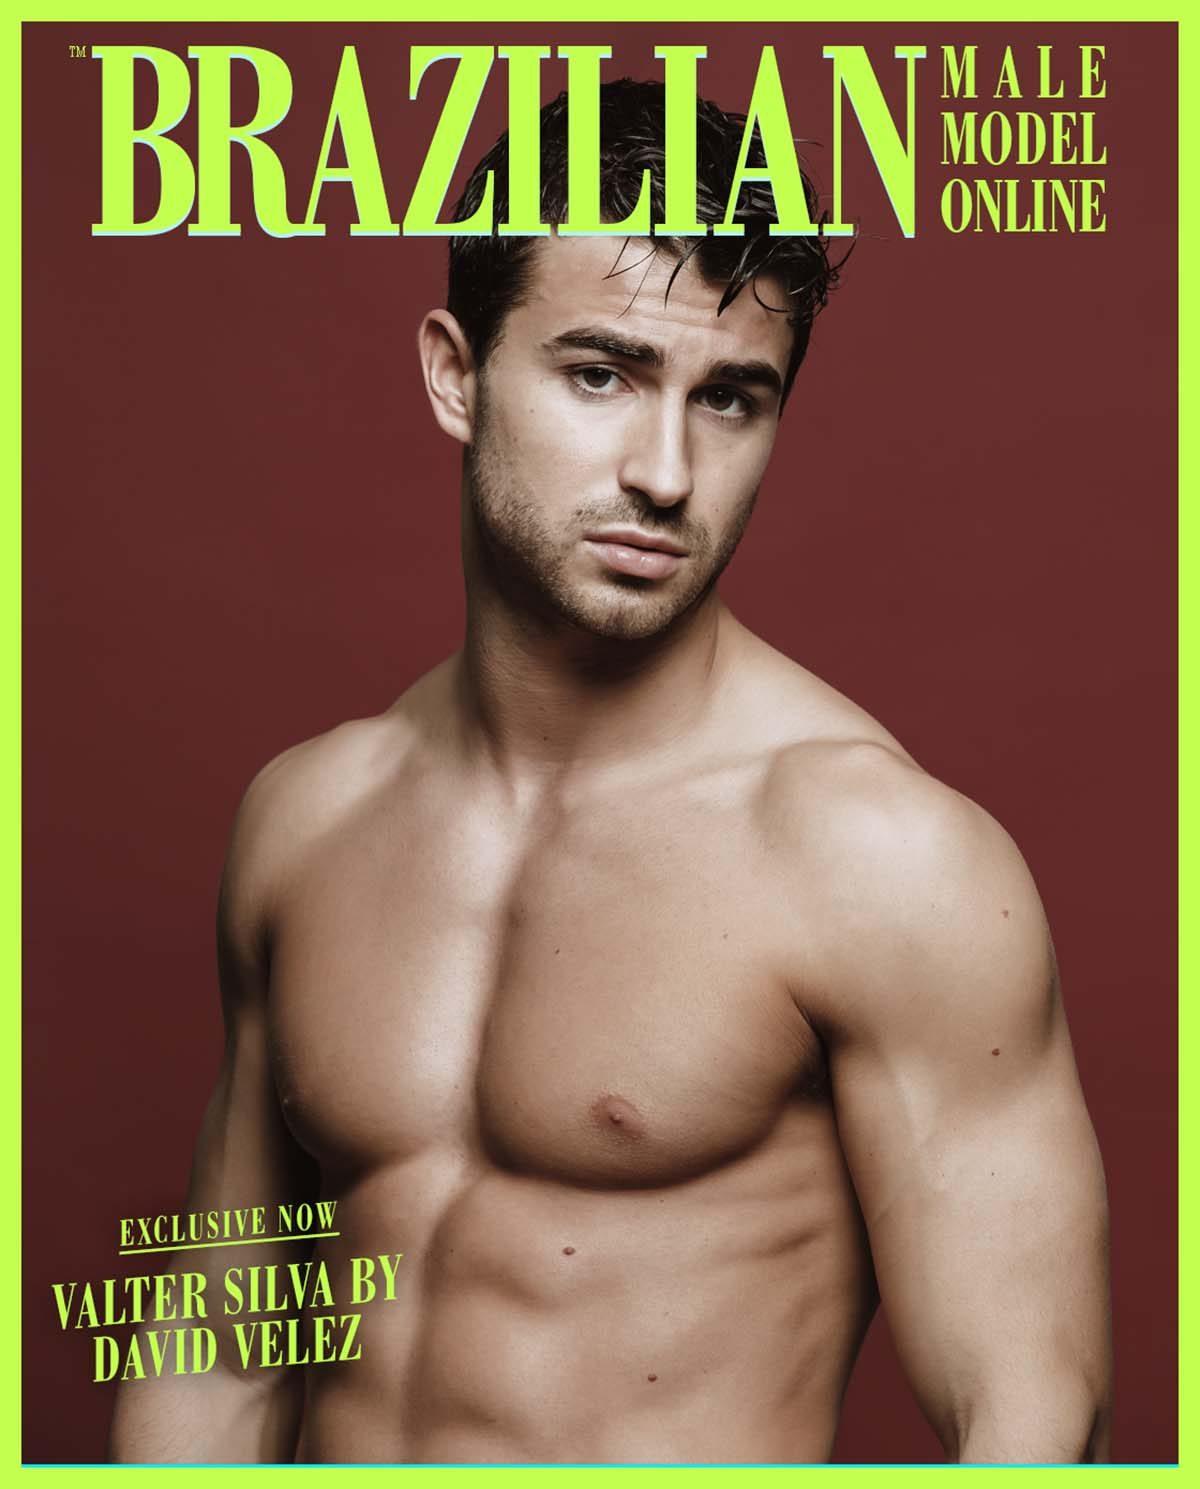 Valter Silva by David Velez